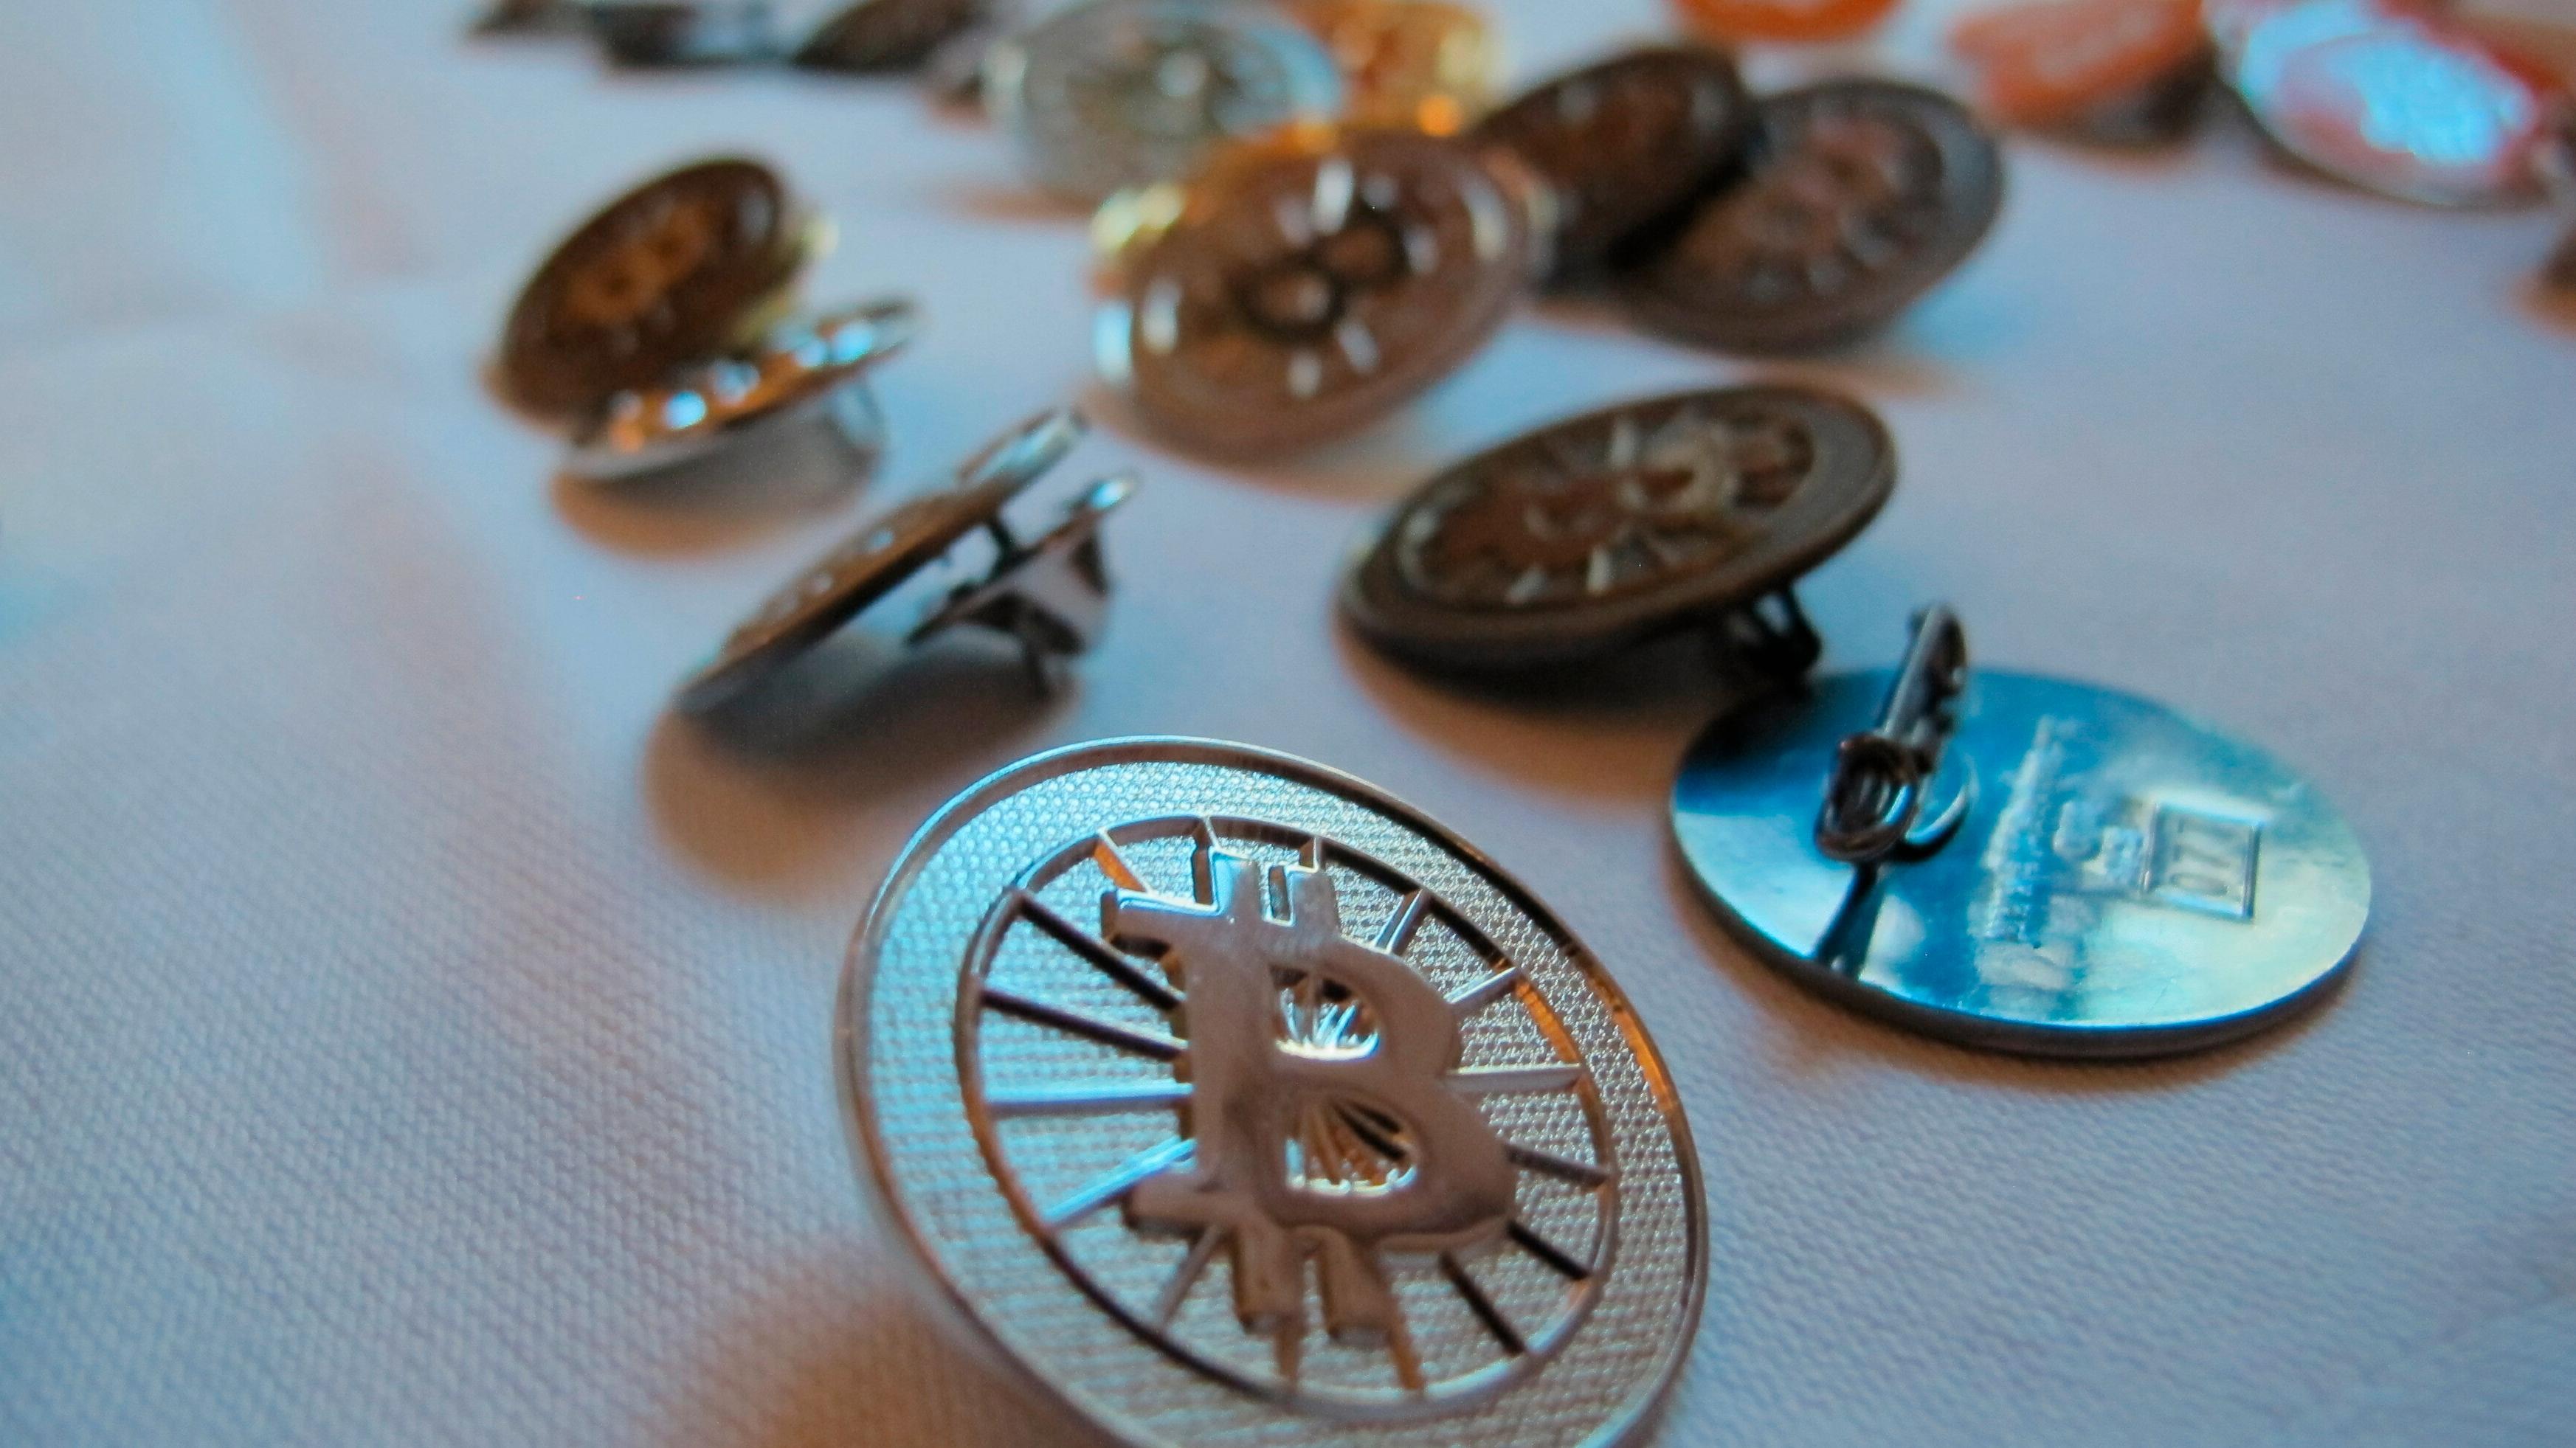 Bitcoins Norge tapte over fire millioner kroner i dataangrep